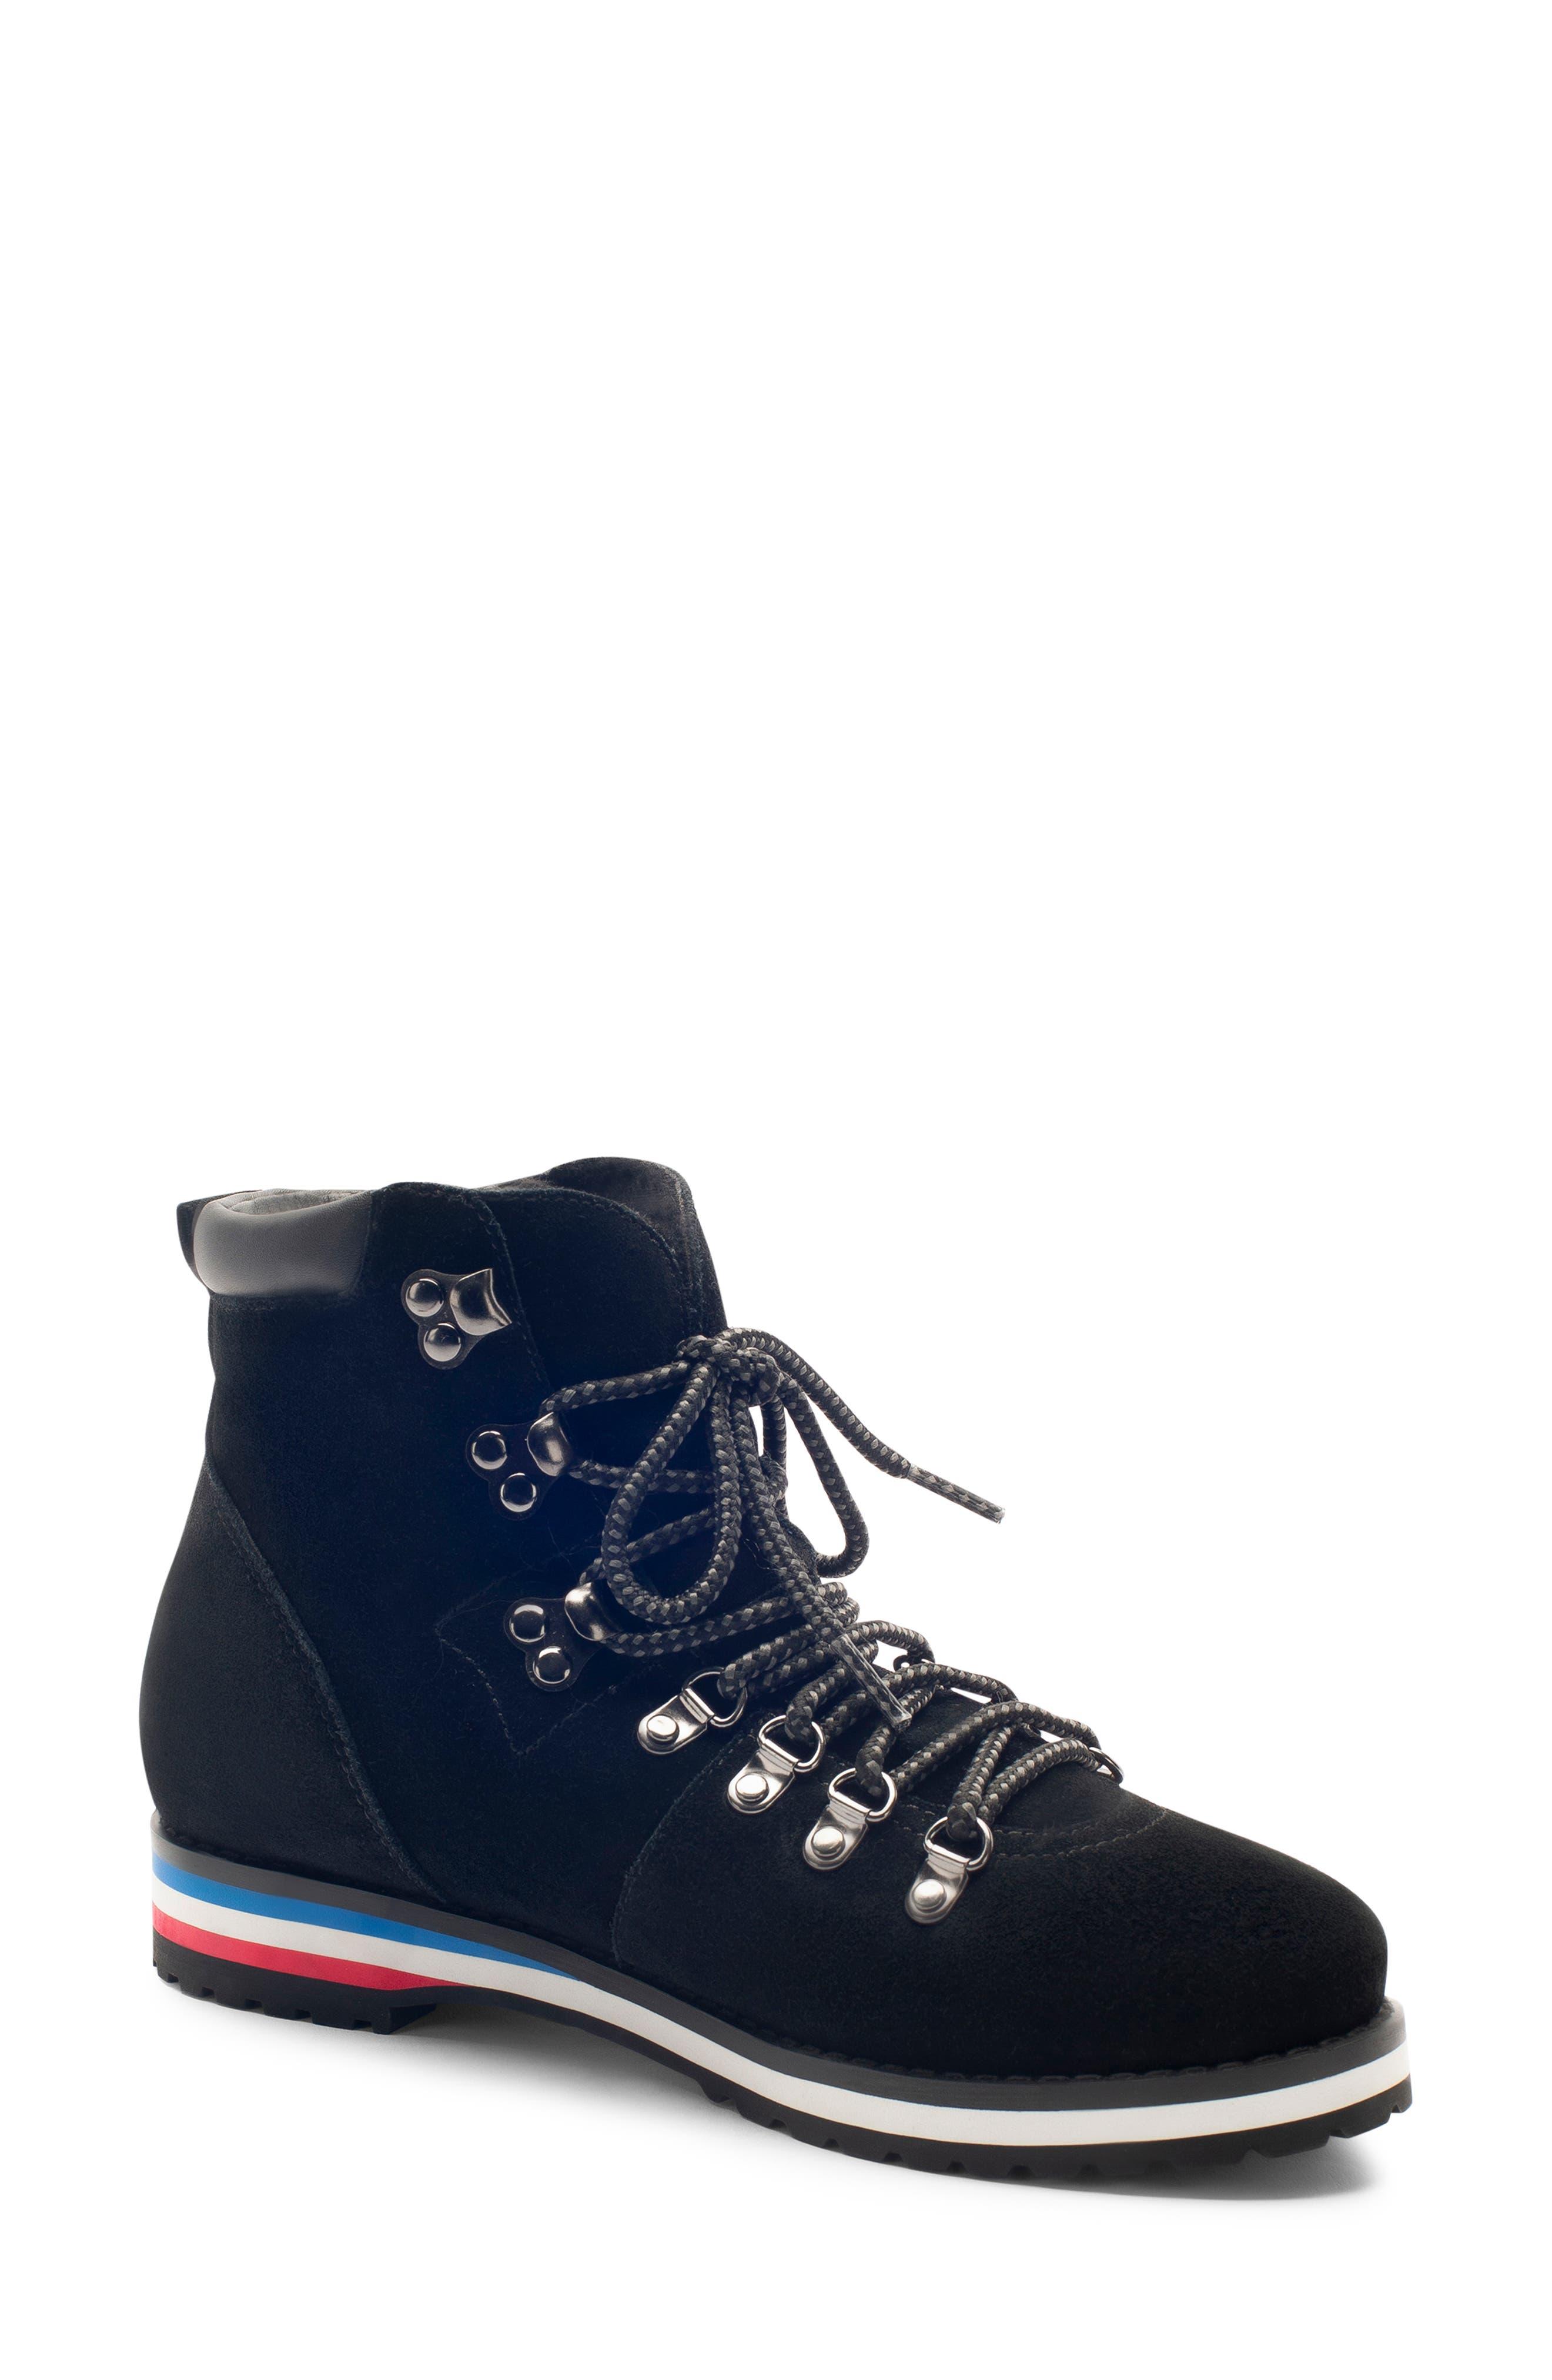 Blondo Regan Waterproof Boot- Black